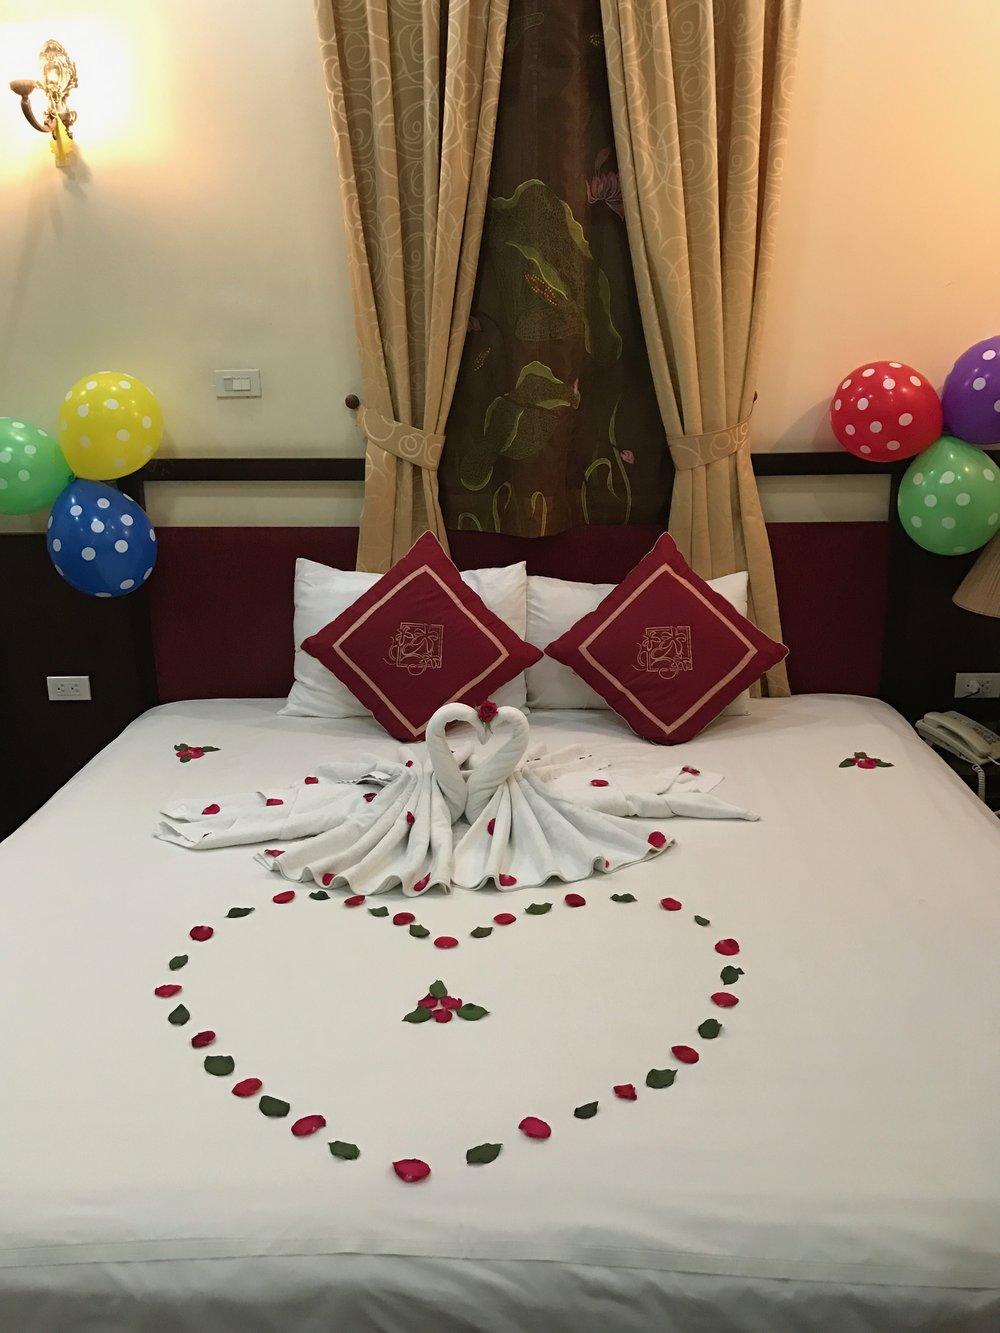 Honeymoon suite at the Posh Hotel